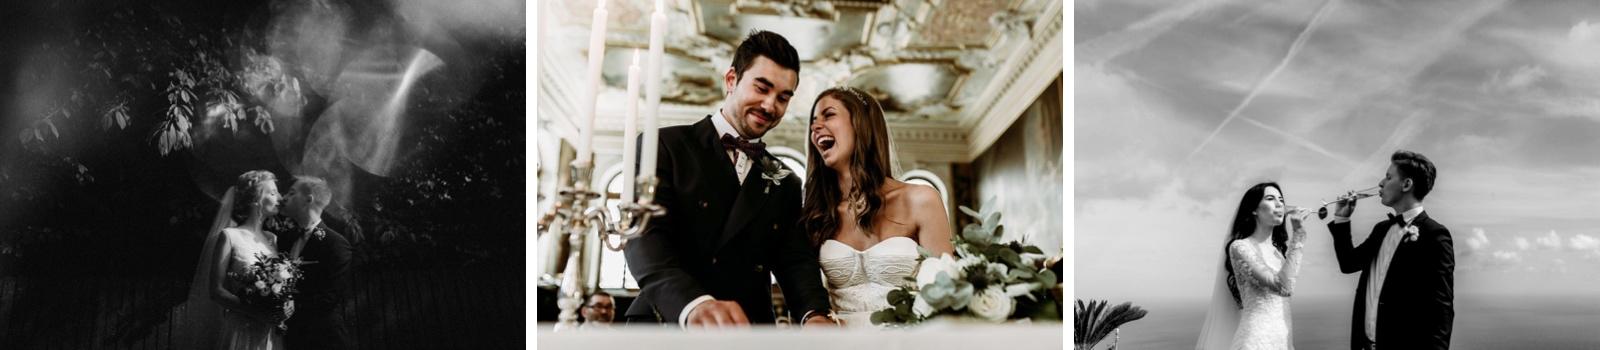 Fotomagoria Best 0f 2018 Wedding Photographer Italy44.jpg